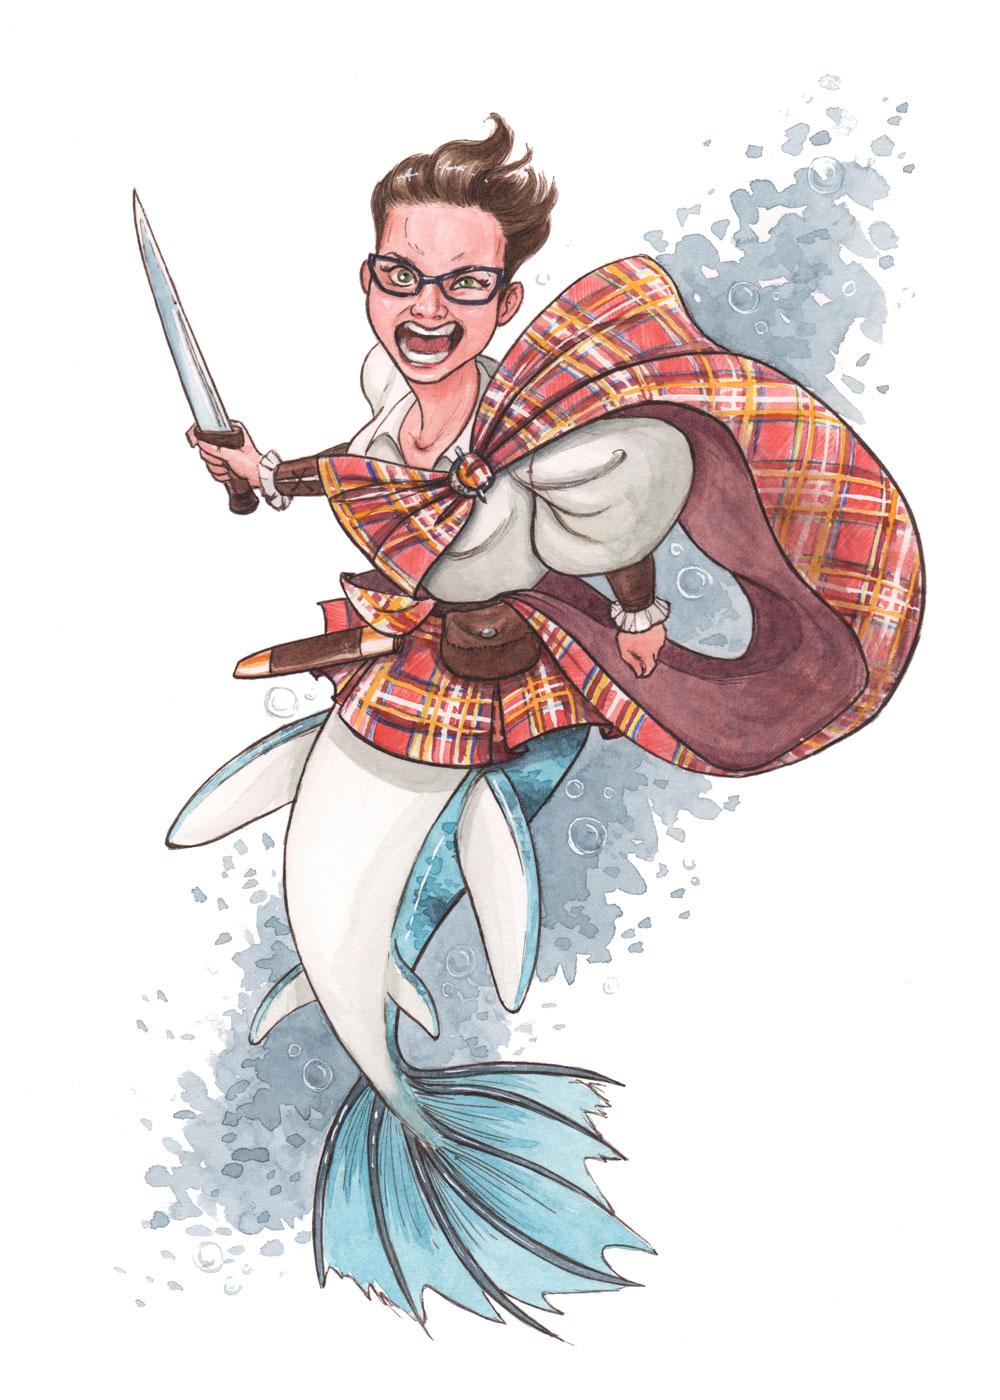 MerMay2019 --Day 13: An Angry Scottish Highlander Loch Ness Monster Mermaid